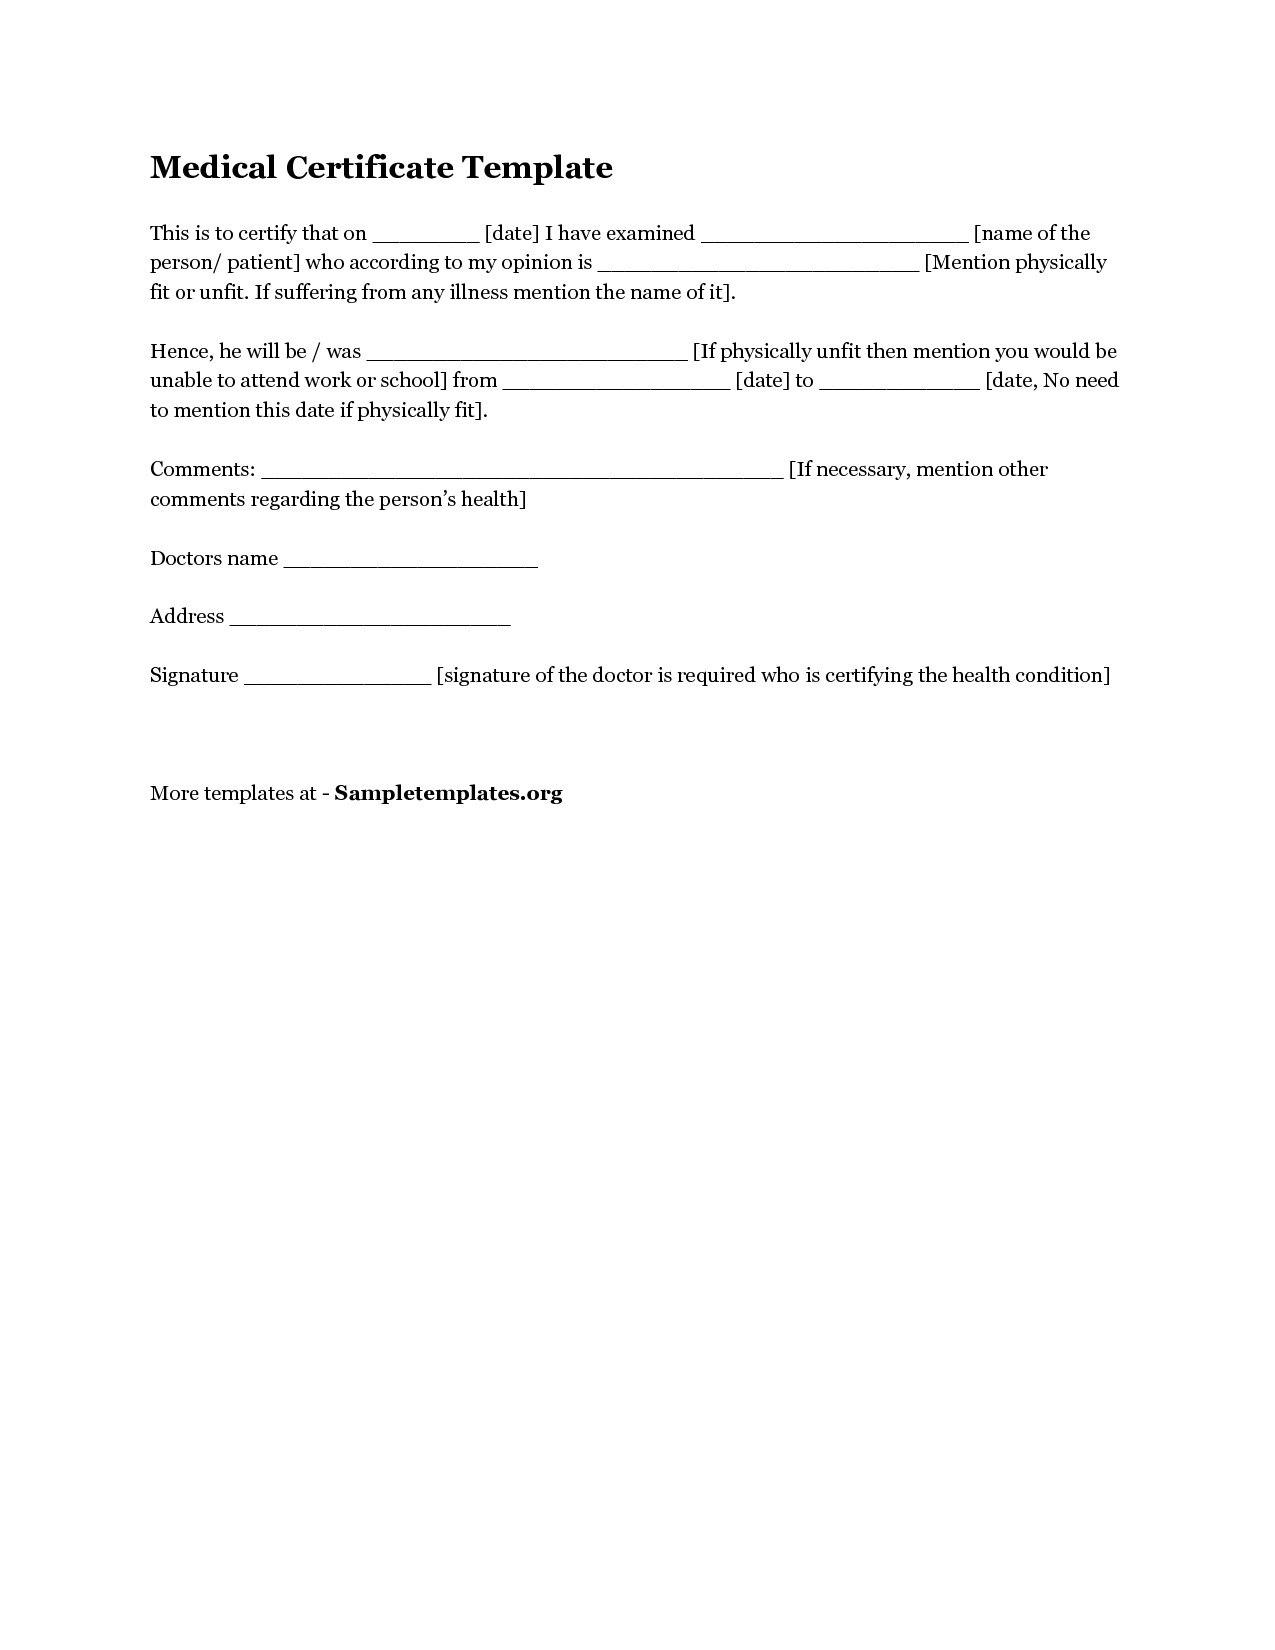 Medical Certificate Example Australia Regarding Australian Doctors Certificate Template